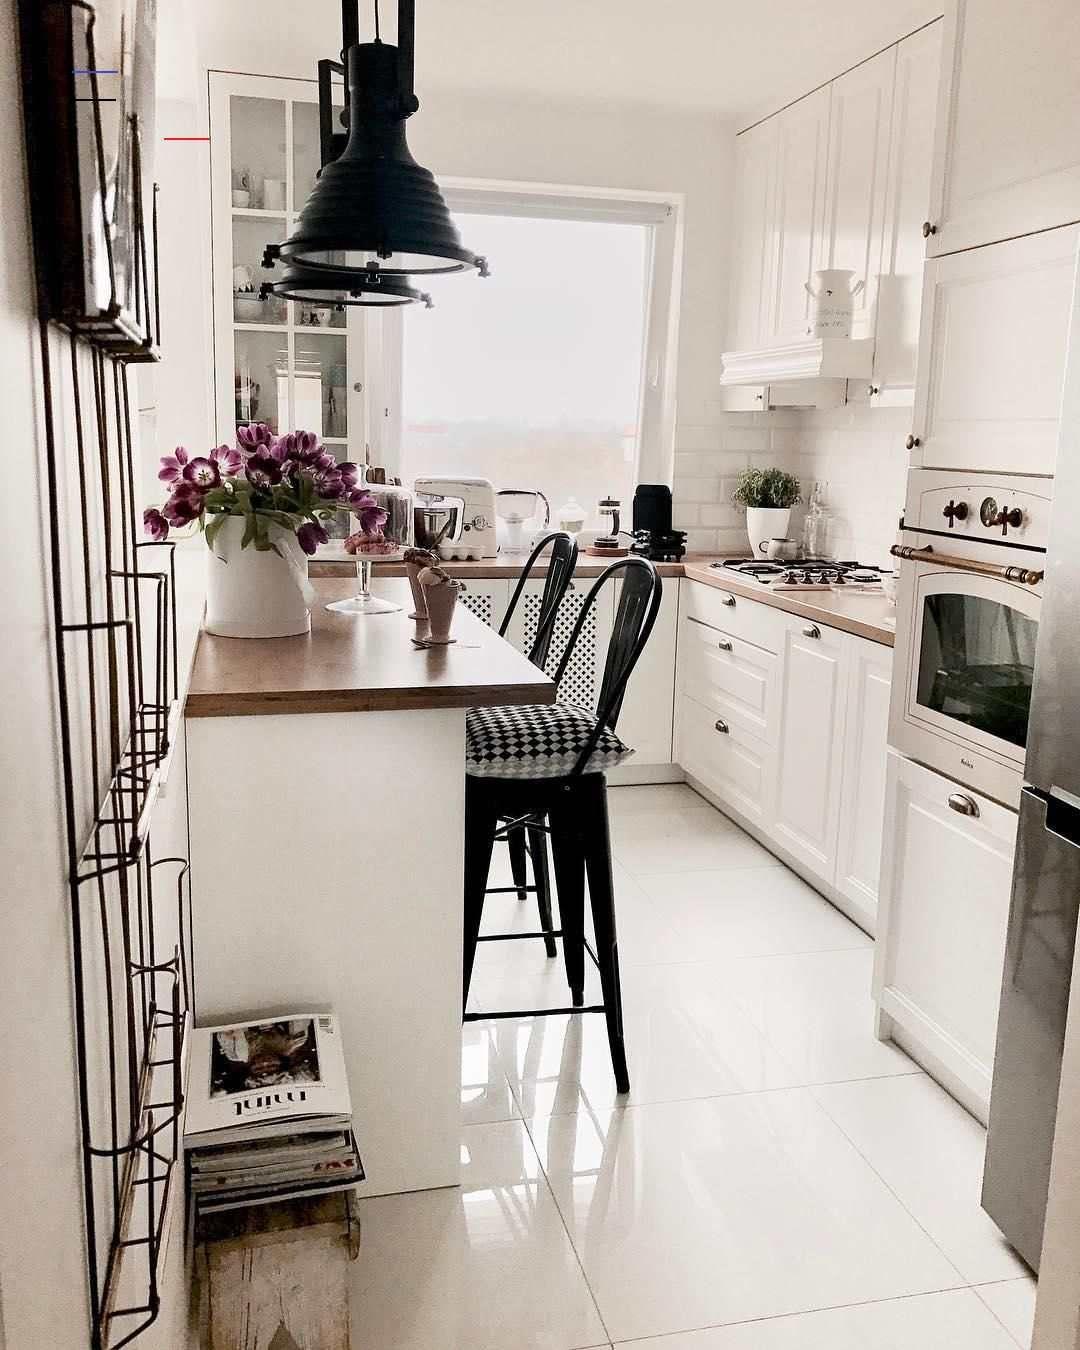 Barhocker Barstühle Online Kaufen Westwingnow Kitchenindustrial In 2020 Kleine Keukens Kleine Keuken Ontwerpen Keuken Ontwerp